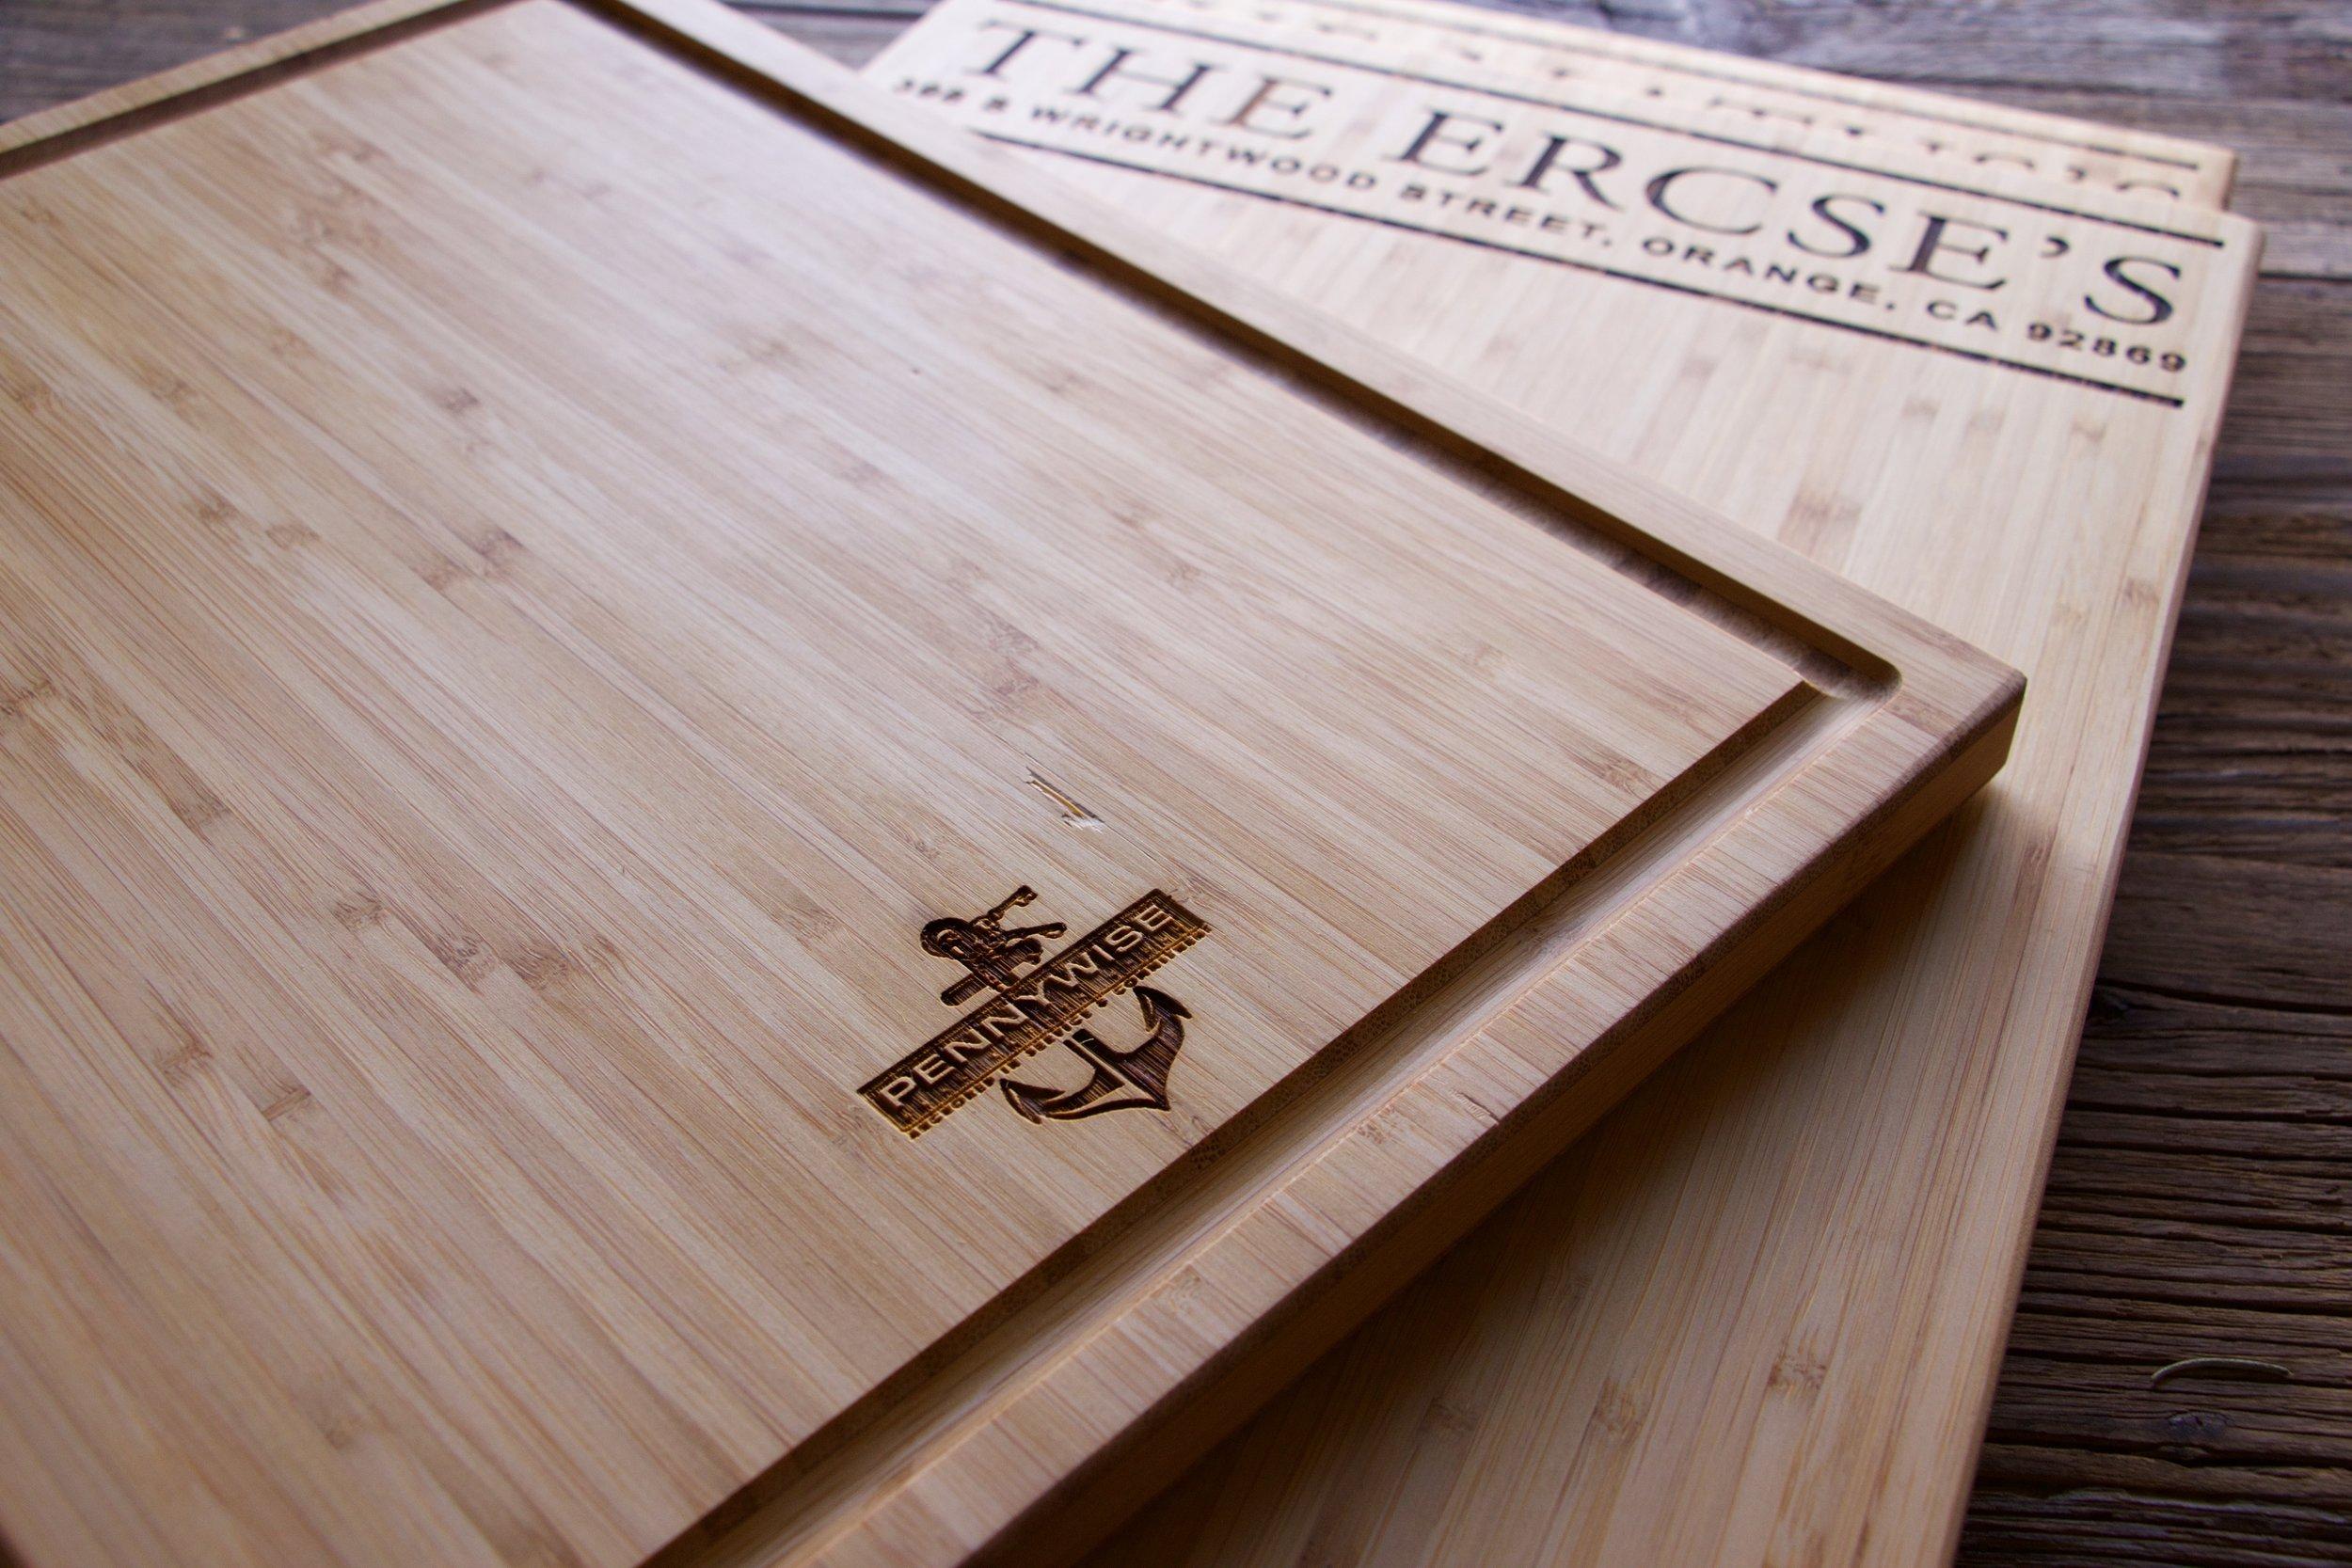 Closing Gift Cutting Board